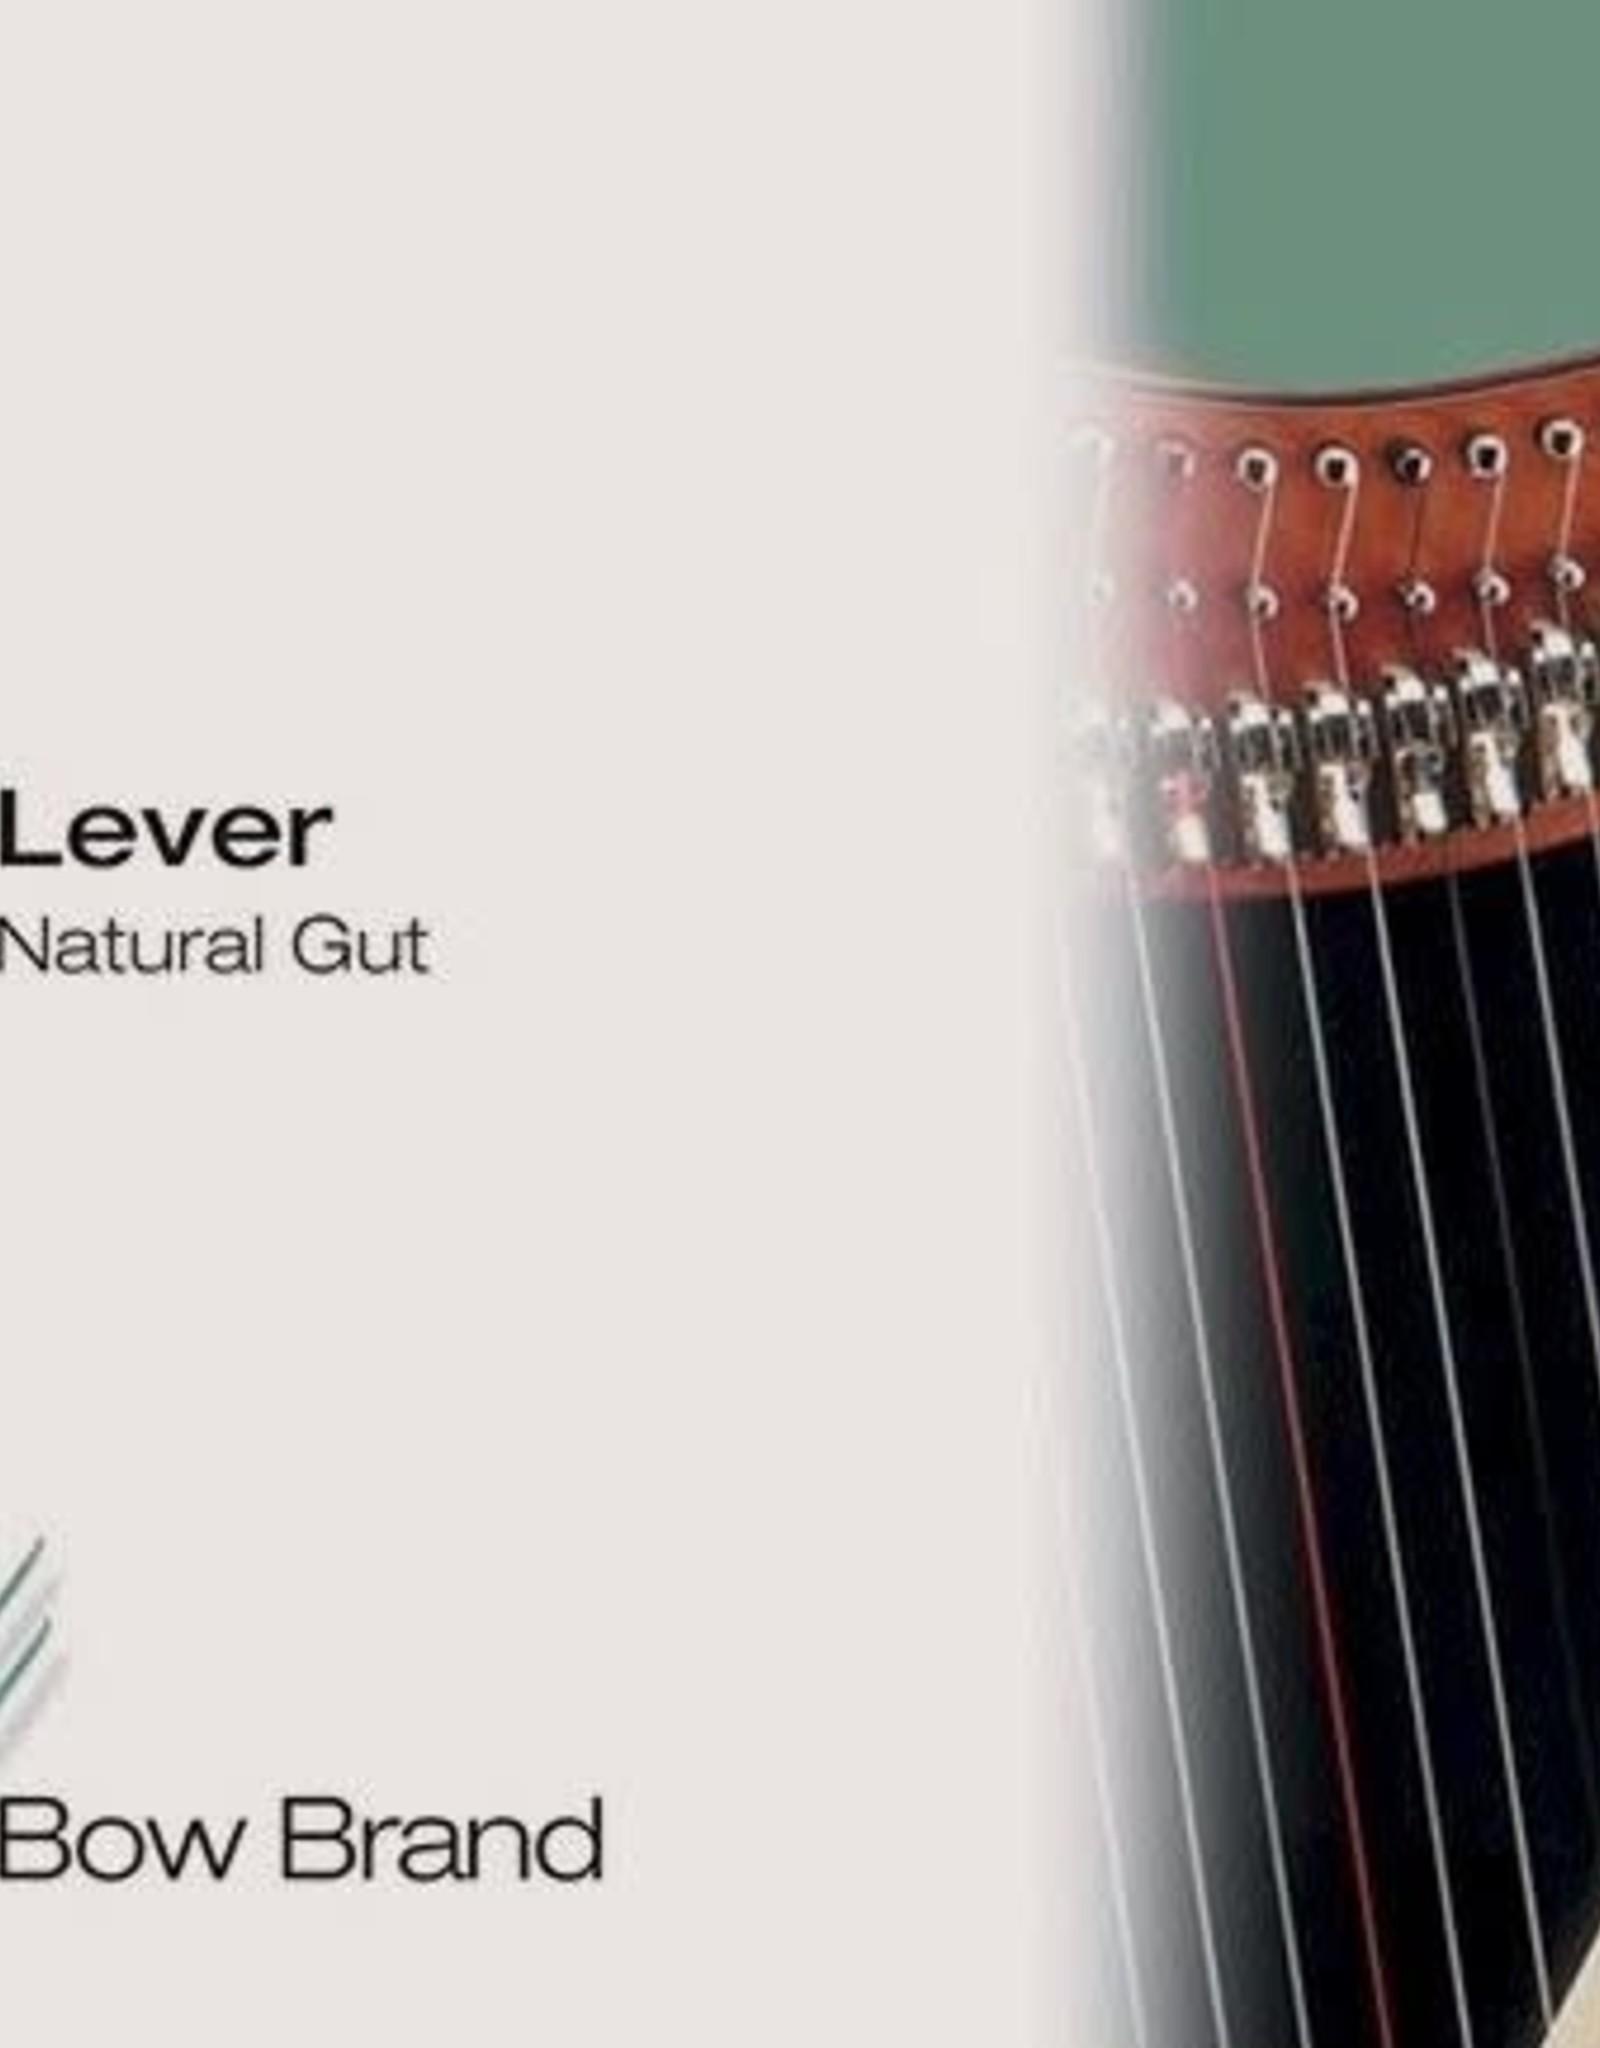 BOW BRAND  klep darm - lever GUT 13/2 sol